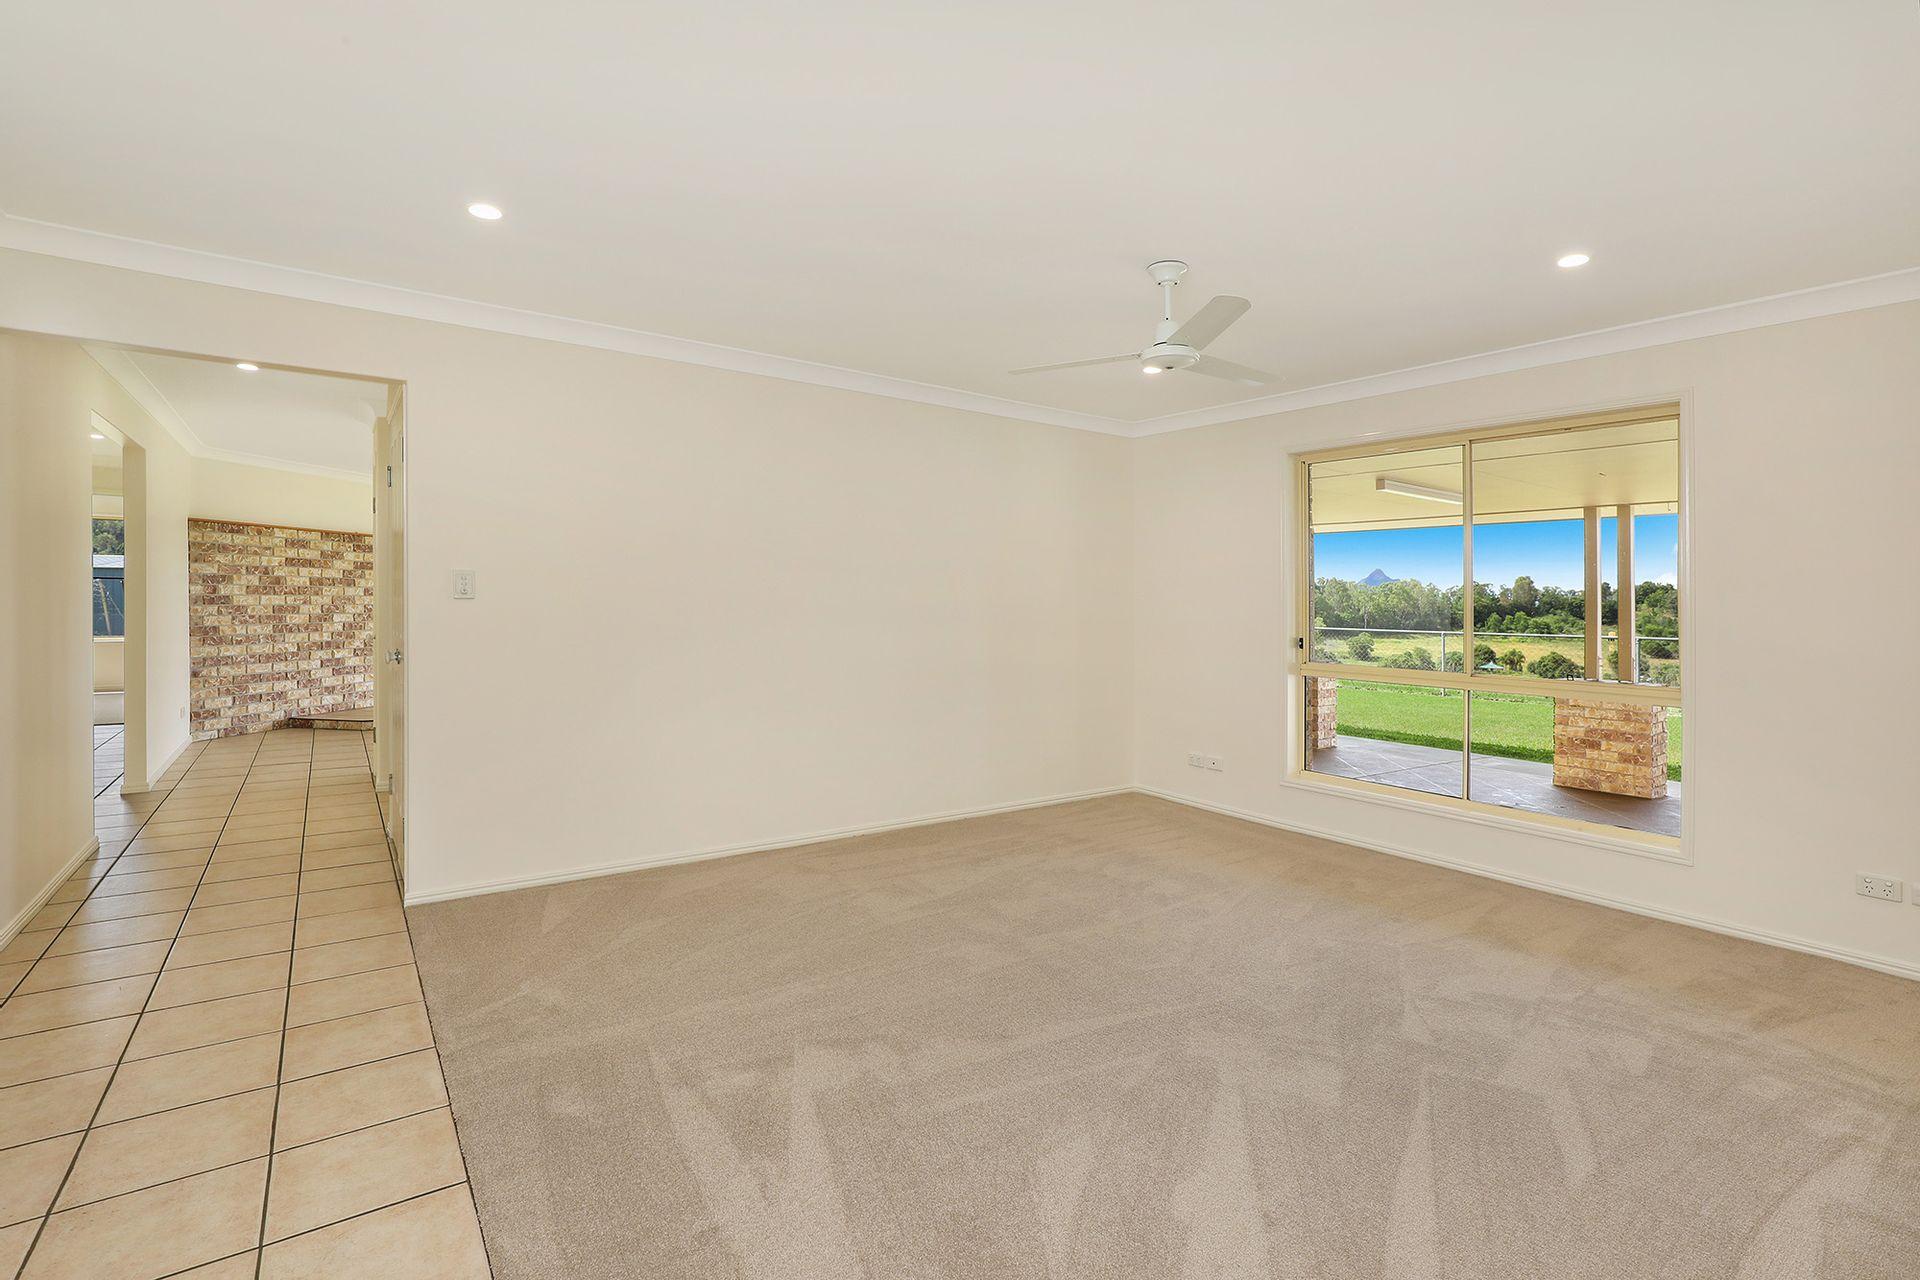 60 Cedarton Drive, Cedarton, QLD  4514